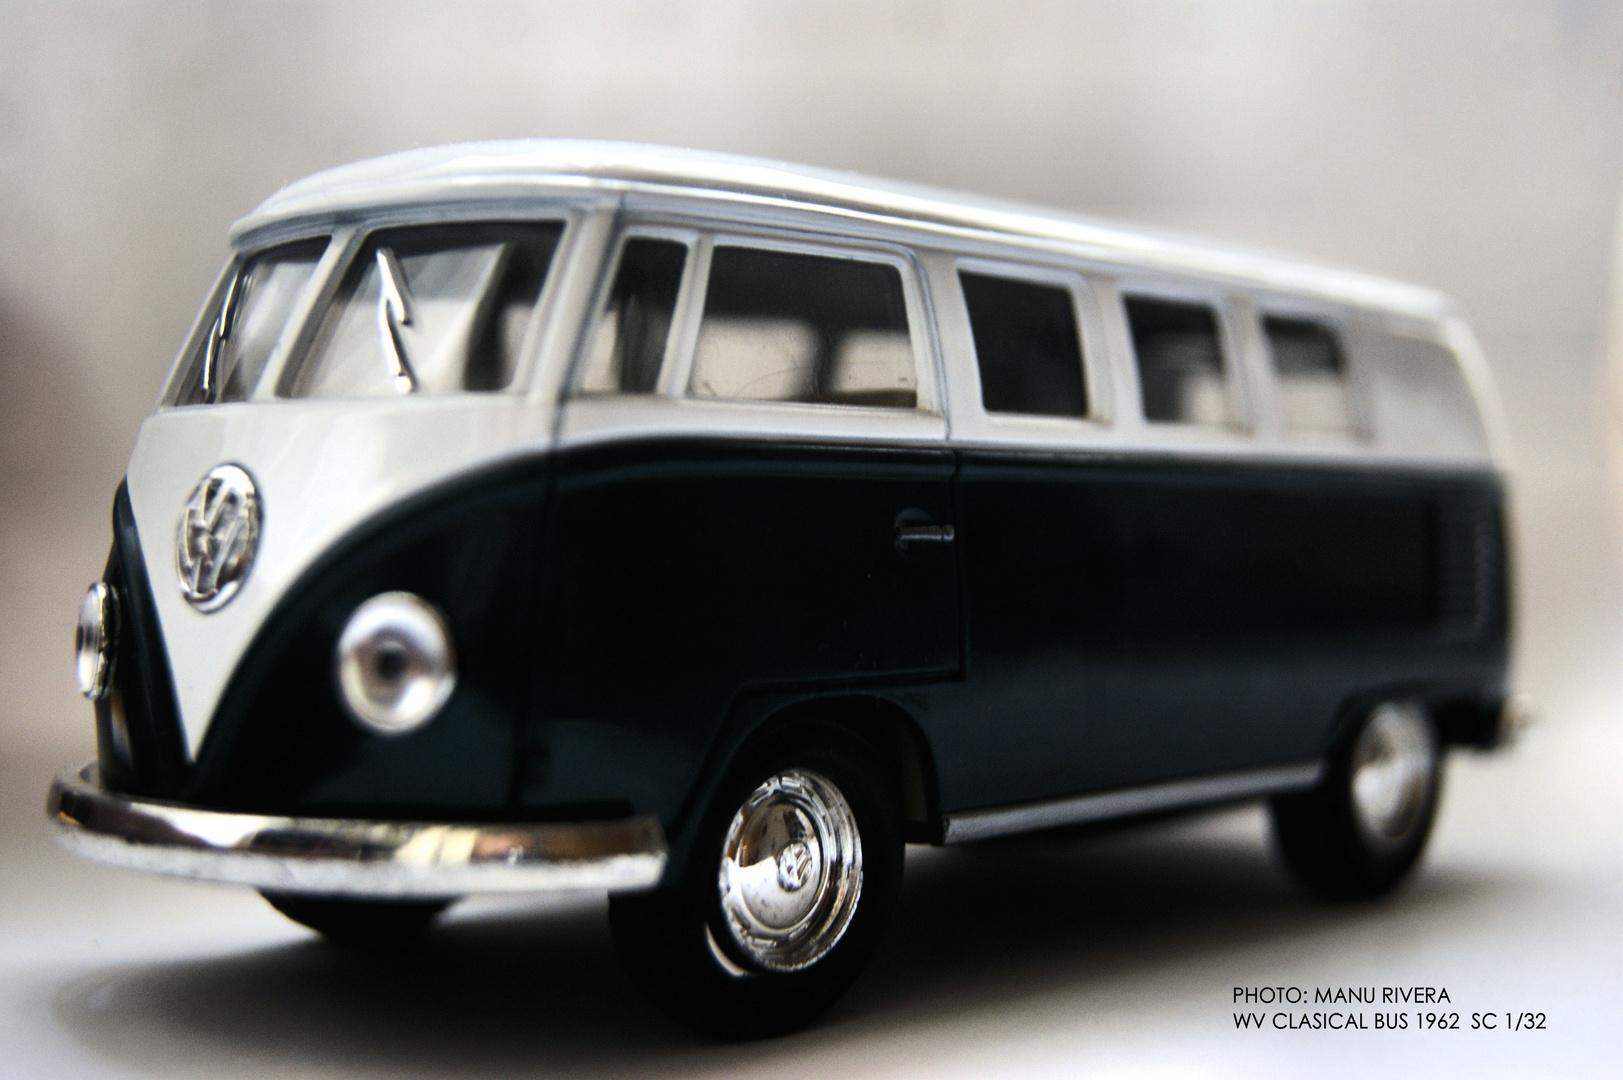 WV CLASSICAL BUS 1962 SCALA 1/32